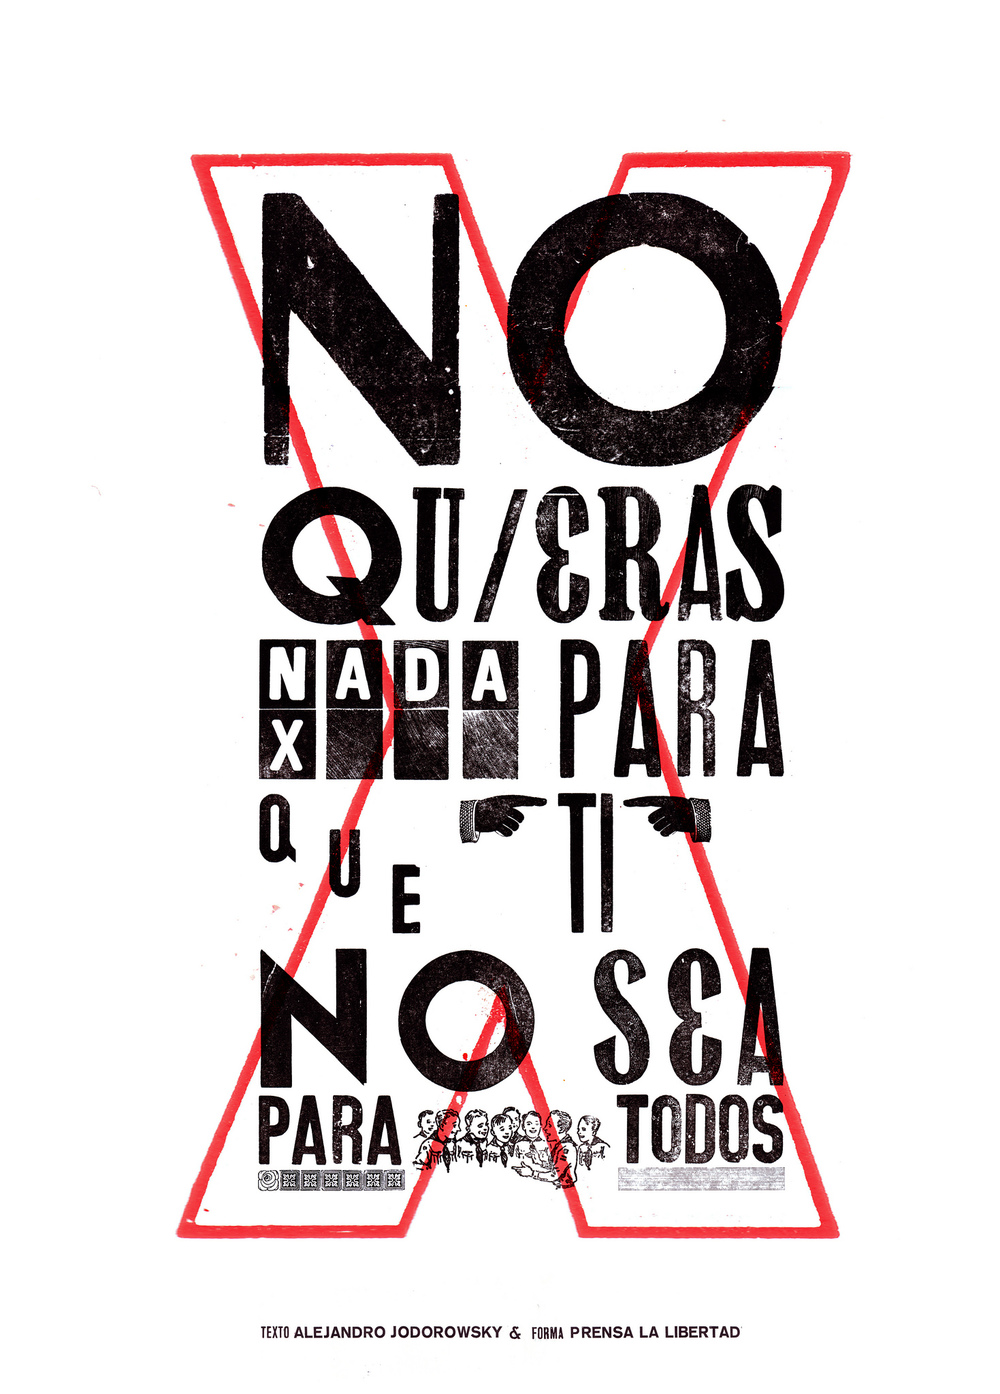 Prensa La Libertad